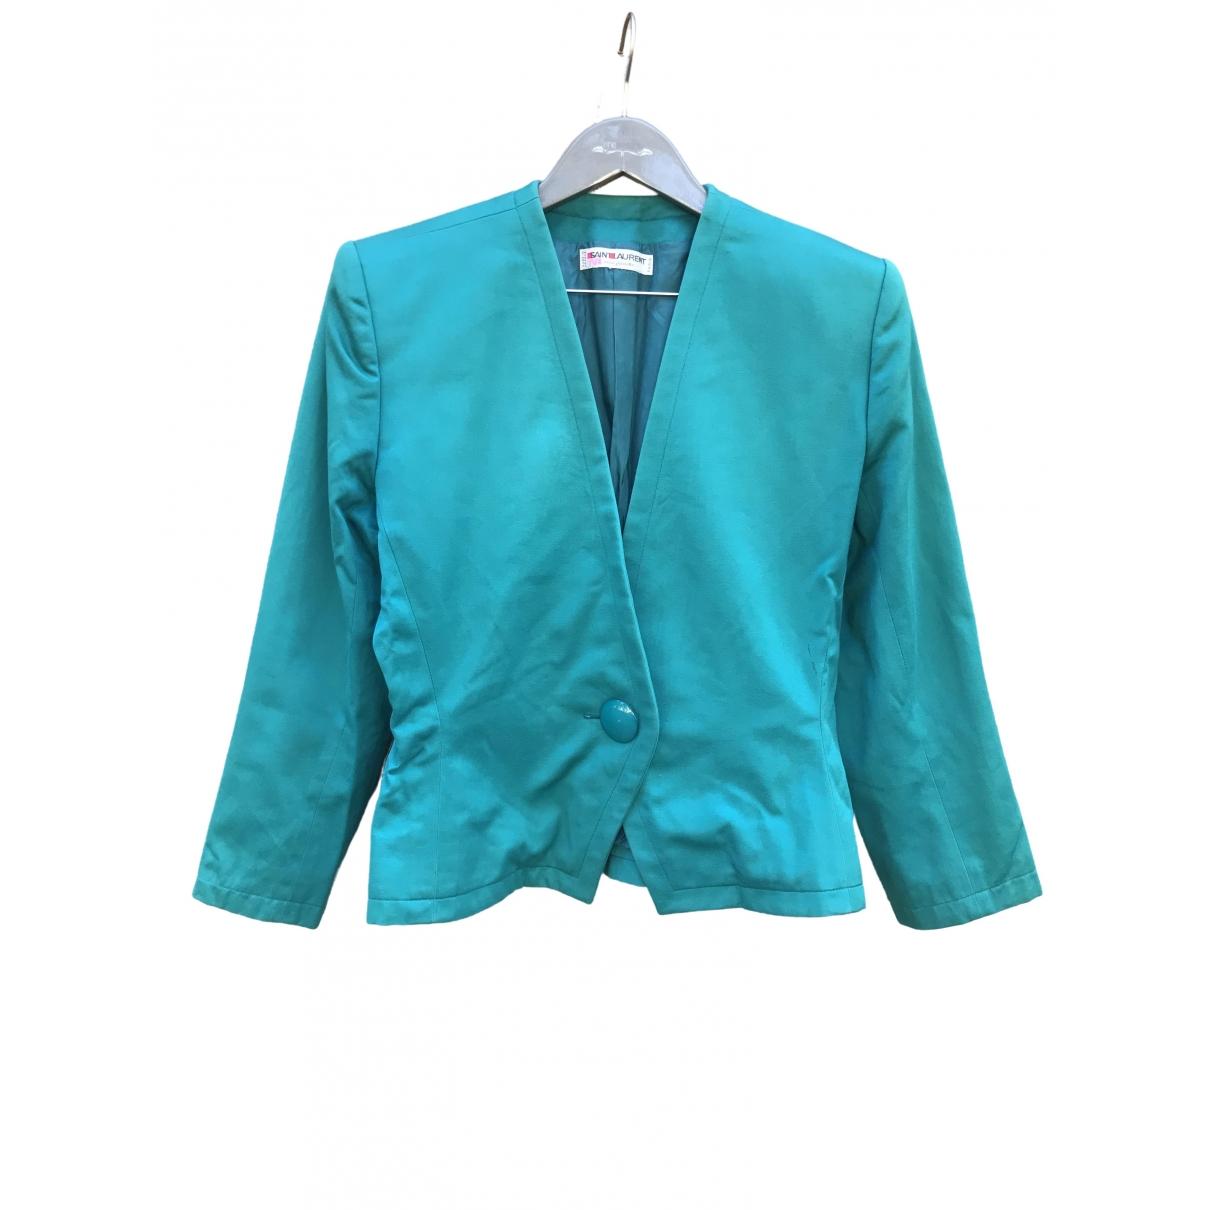 Yves Saint Laurent \N Turquoise Cotton jacket for Women M International